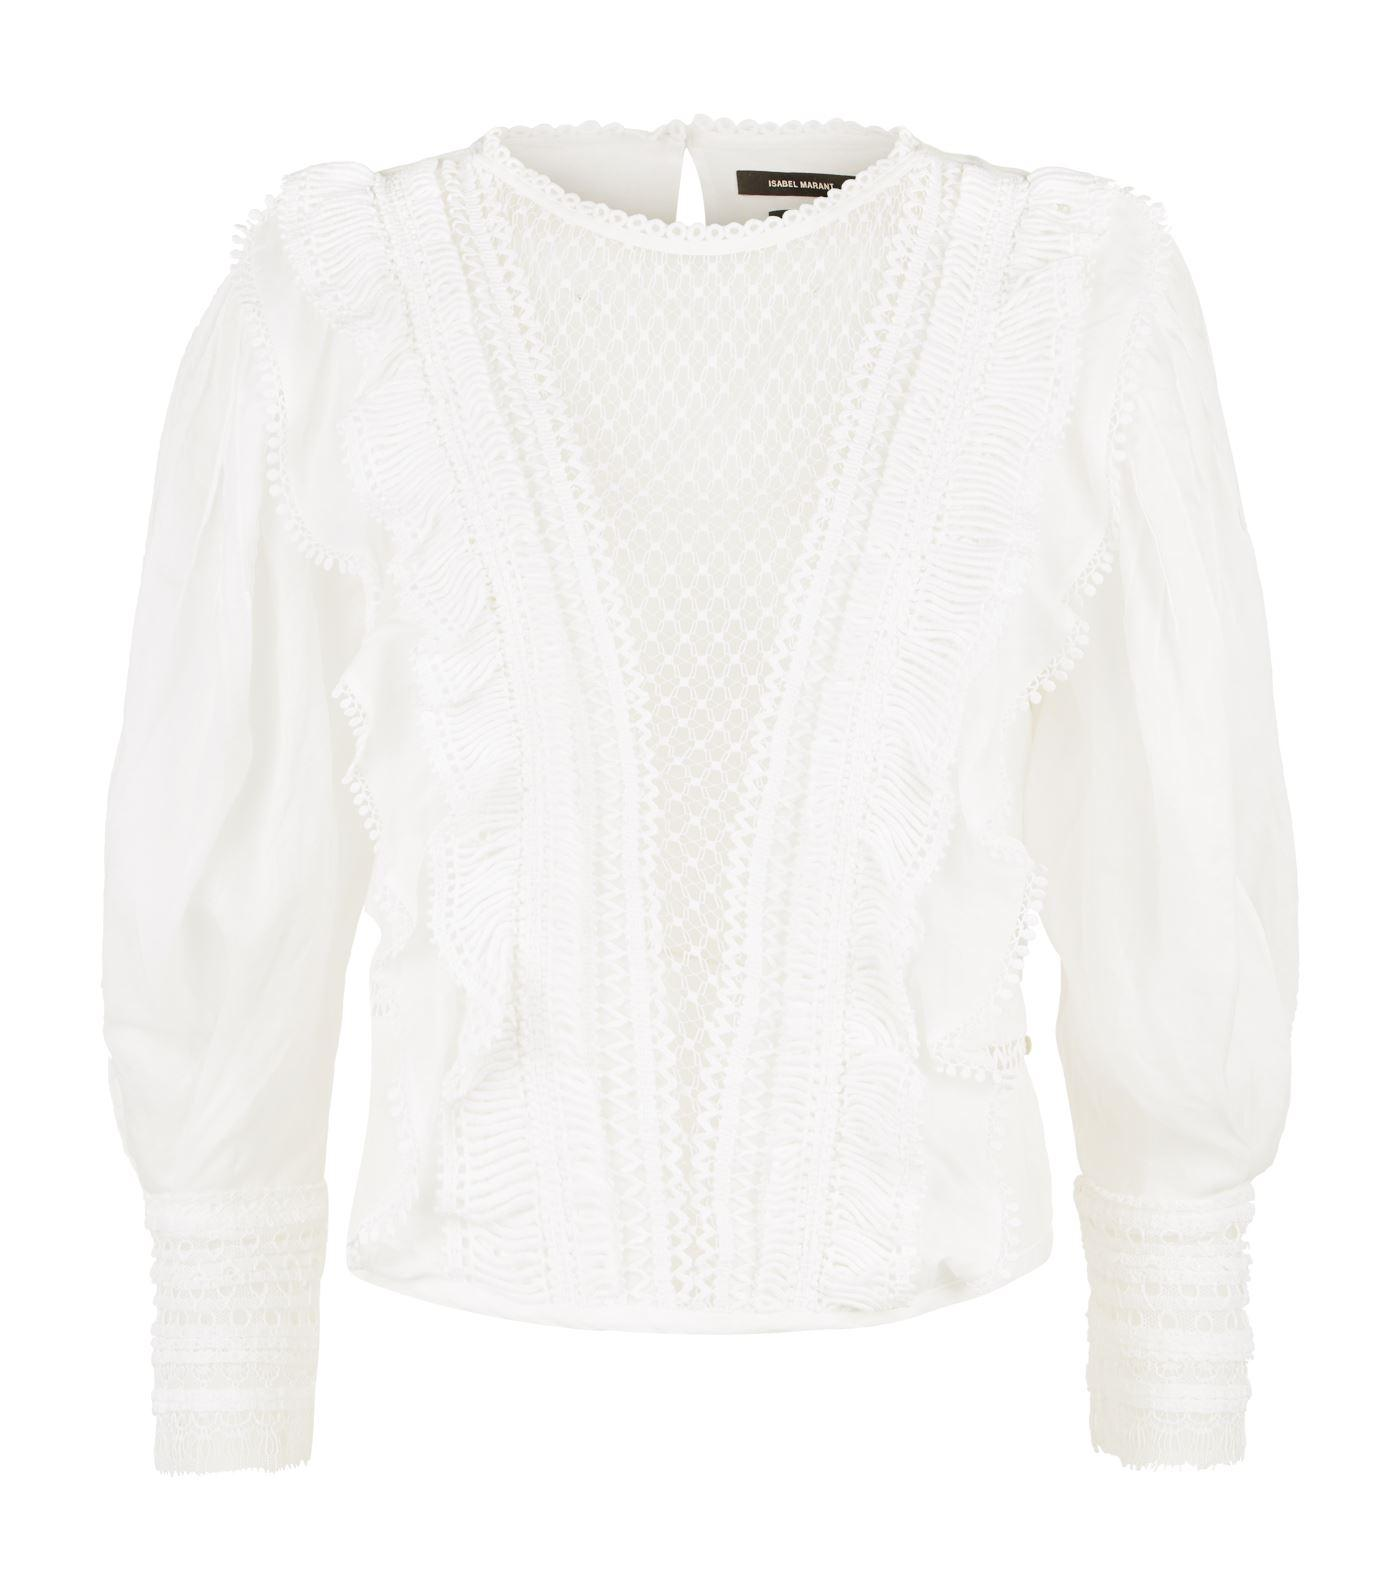 8184fdcc1b5619 Isabel Marant - White Rosen Sheer Lace Top - Lyst. View fullscreen